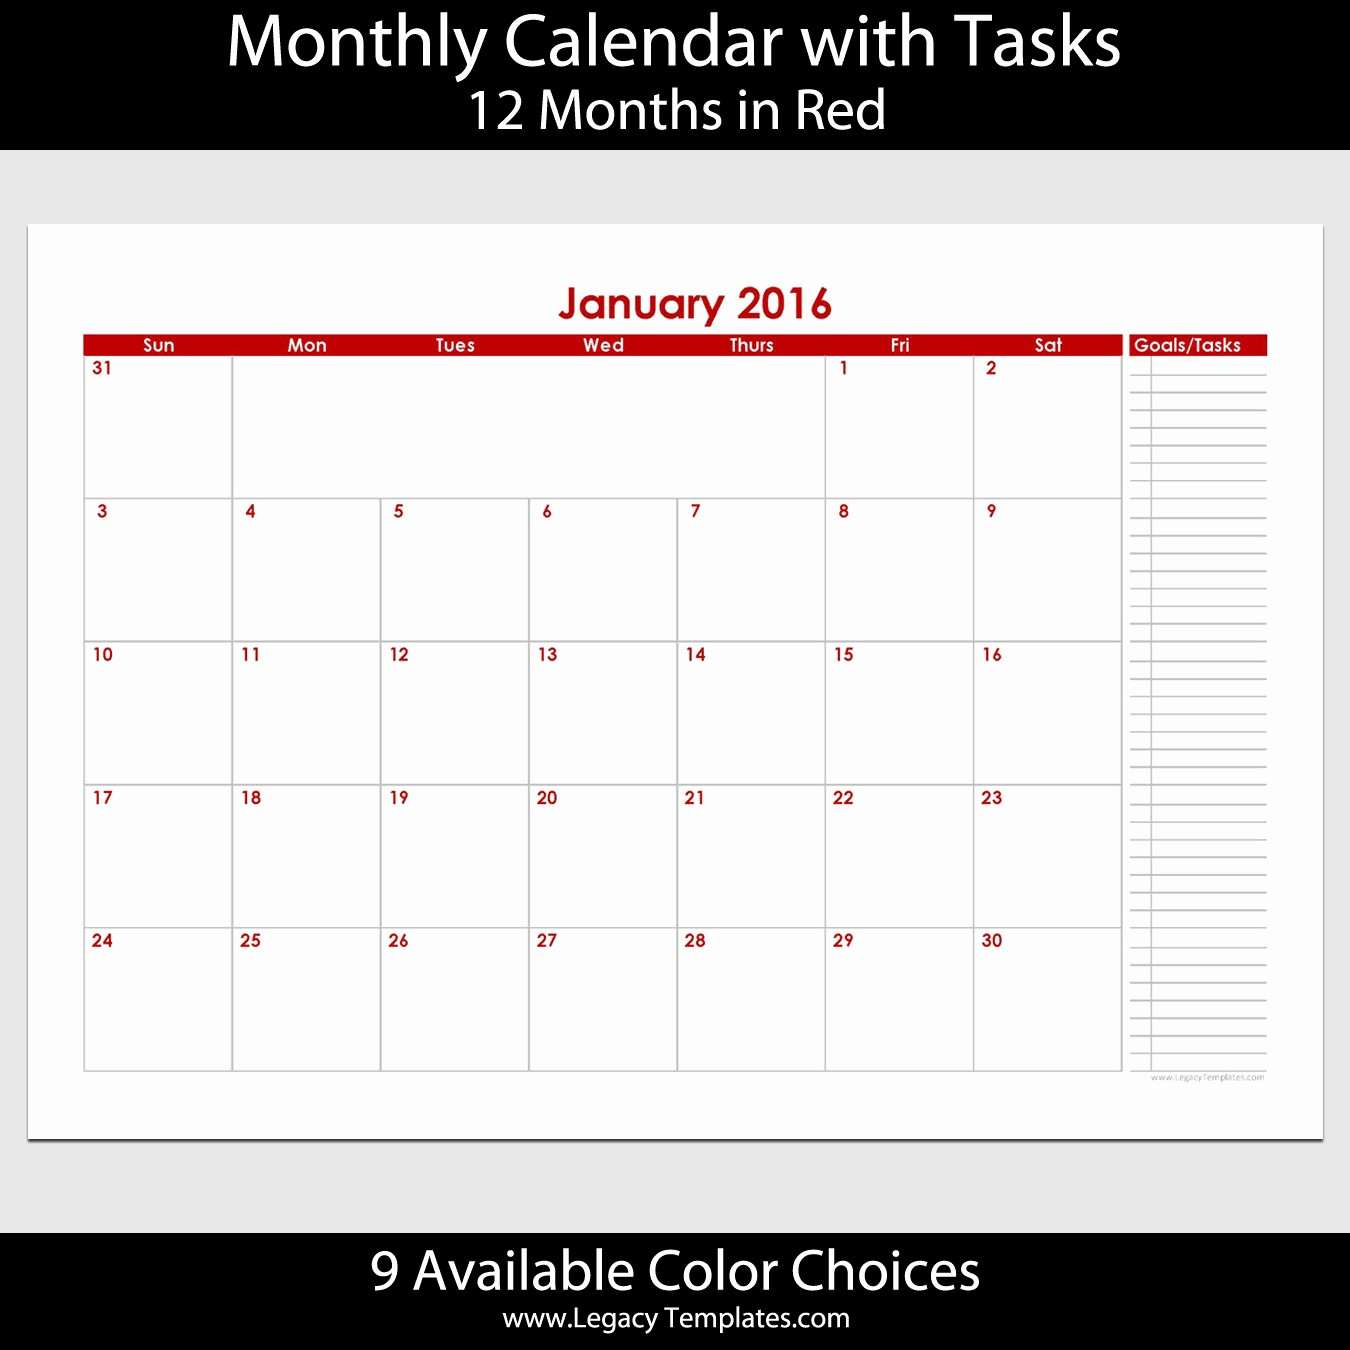 12 Month Calendar for 2016 New 2016 12 Month Landscape Calendar with Tasks – A5